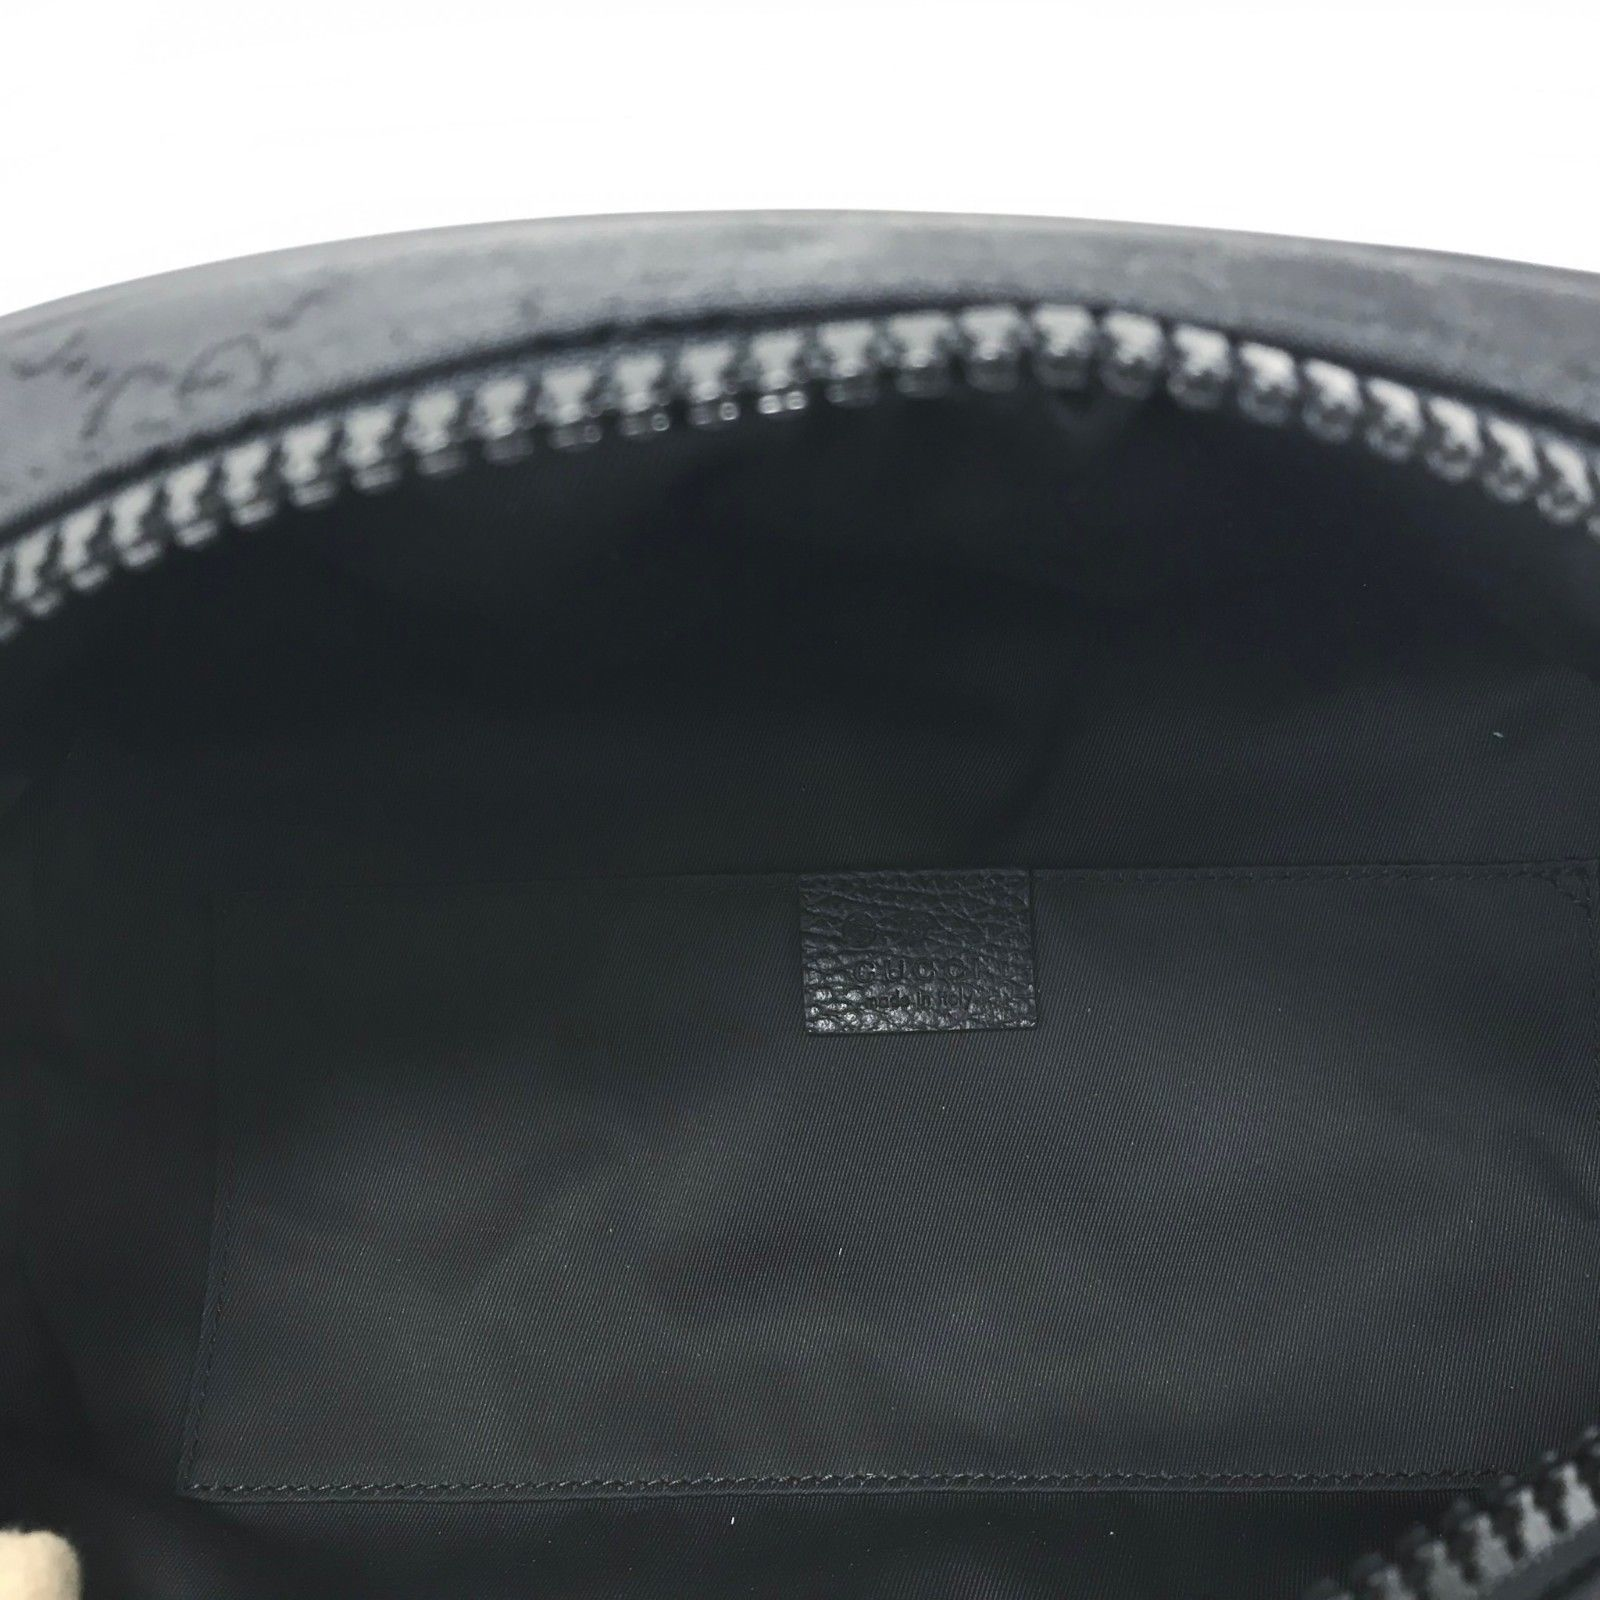 263ee54edac860 NWT GUCCI 449182 GG Guccissima Black Nylon w/ Web Stripe Strap Belt Bag